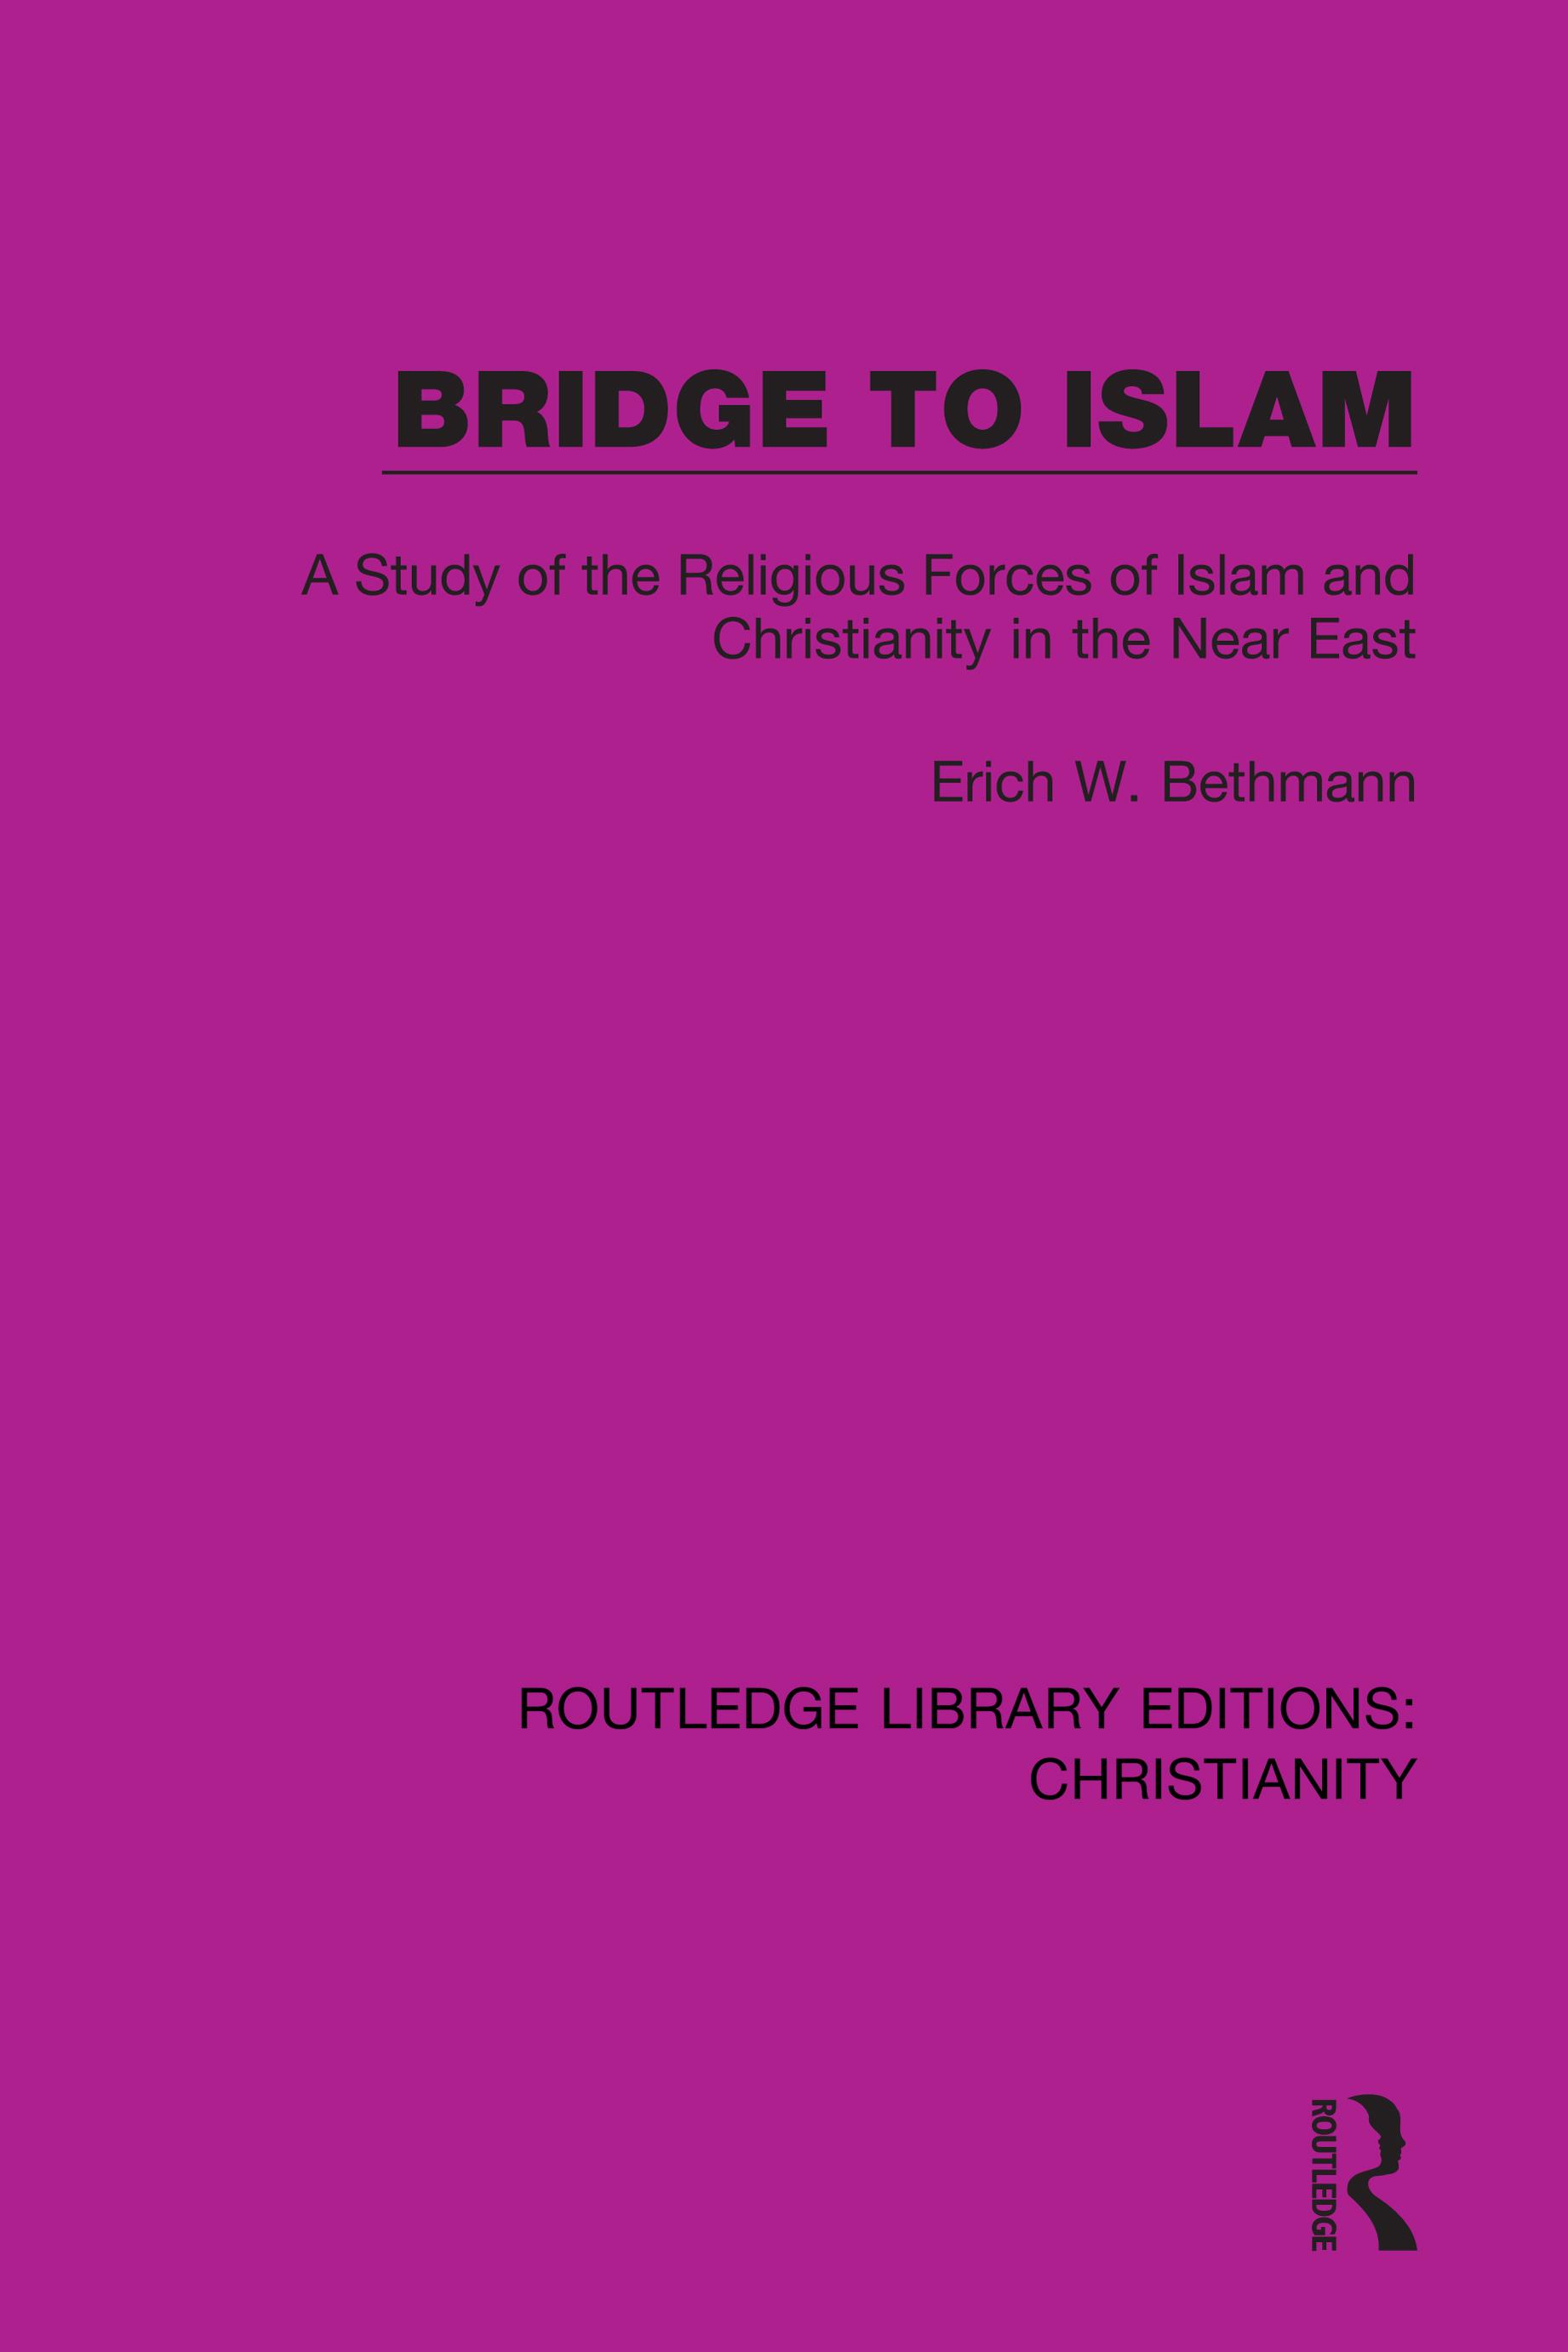 Bridge to Islam